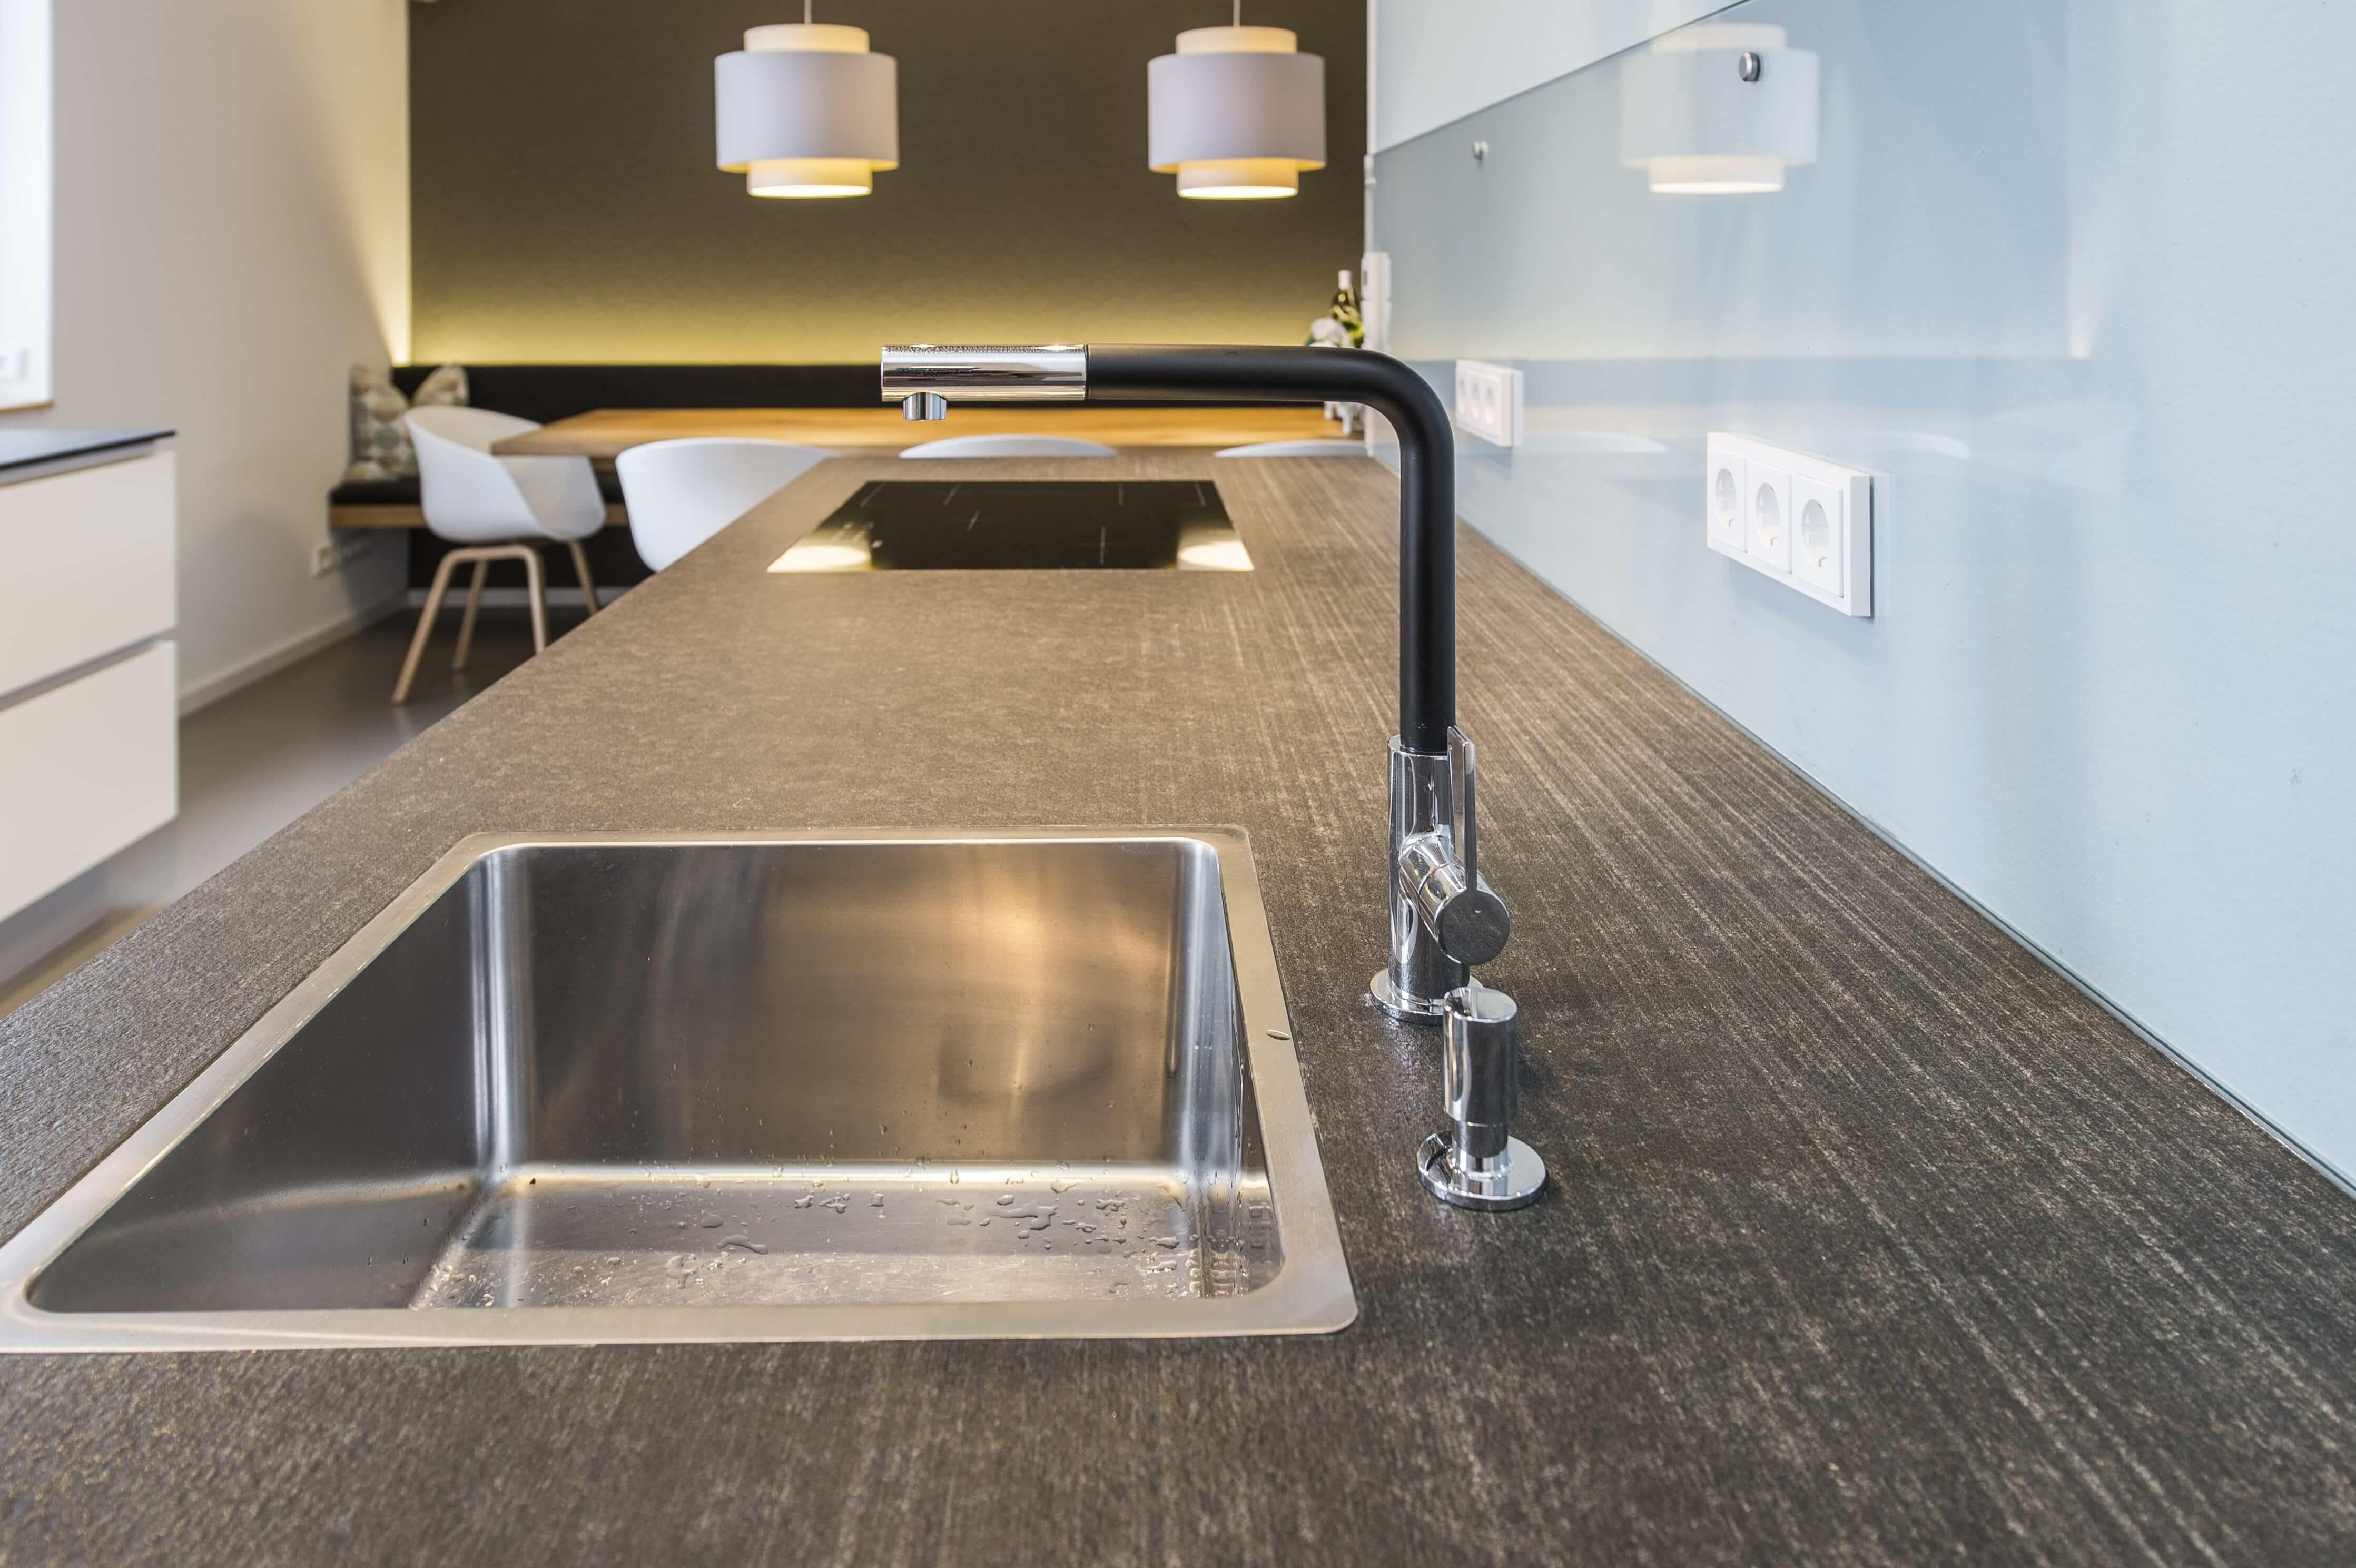 Kuchenspule Design Idee Spule Kuche Modern Inspiration